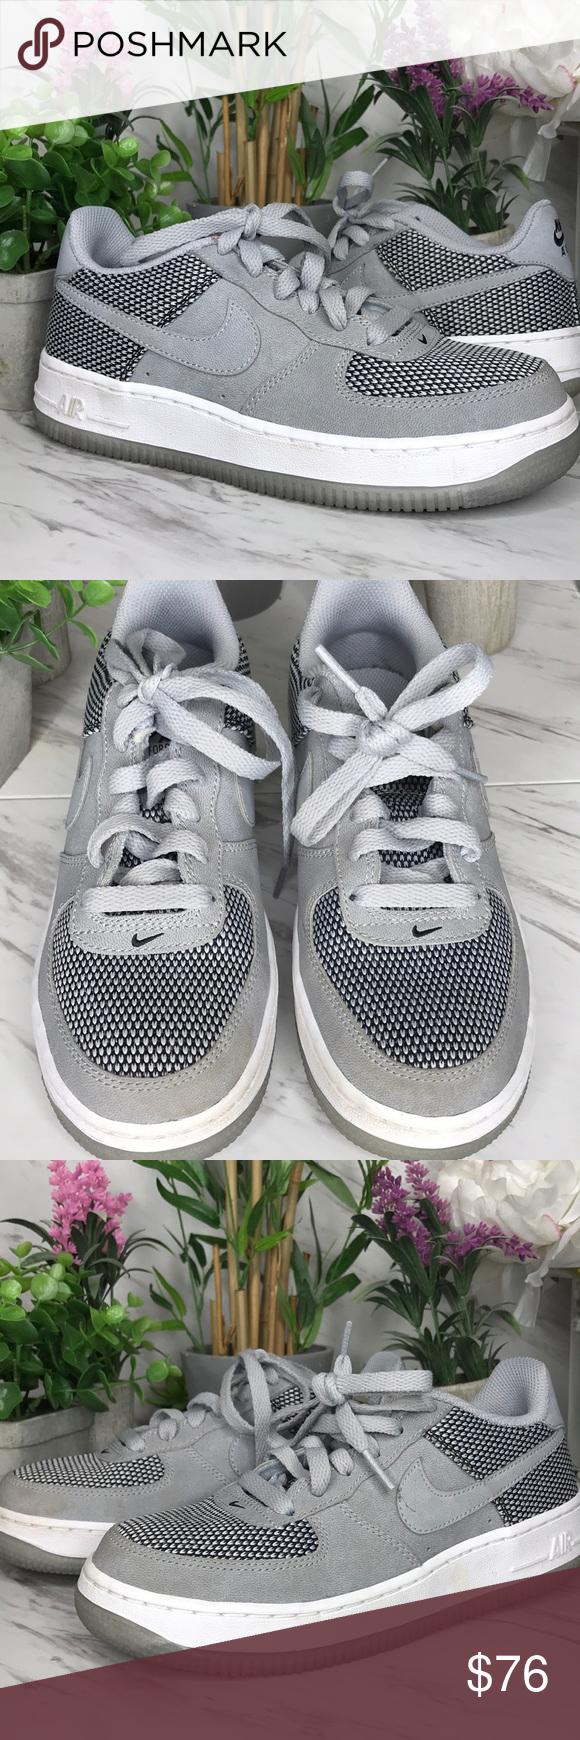 Boys Nike Air Force 1 Size 4Y Boys nike, Nike air, Nike